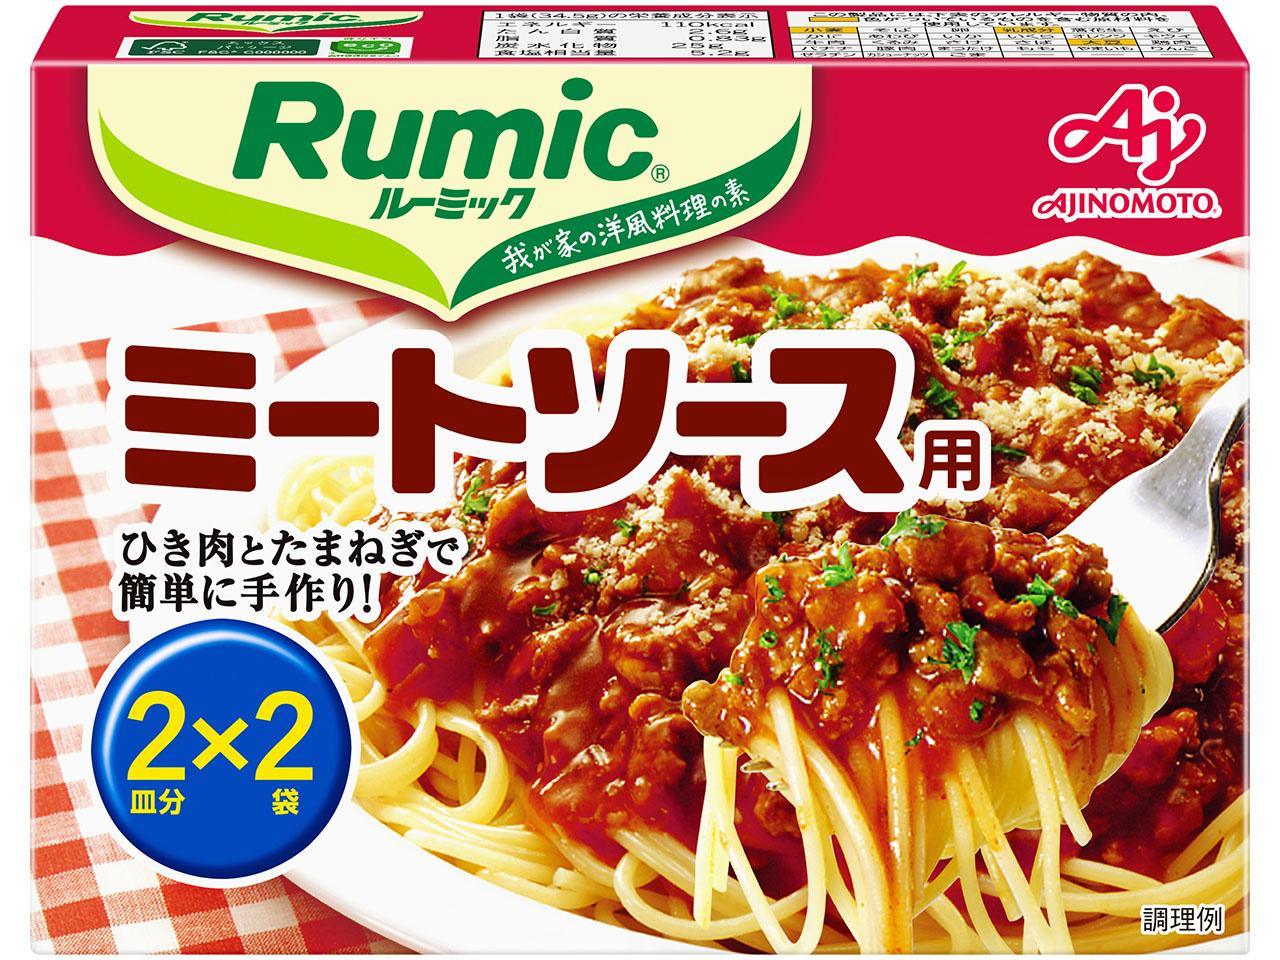 「Rumic」ミートソース用